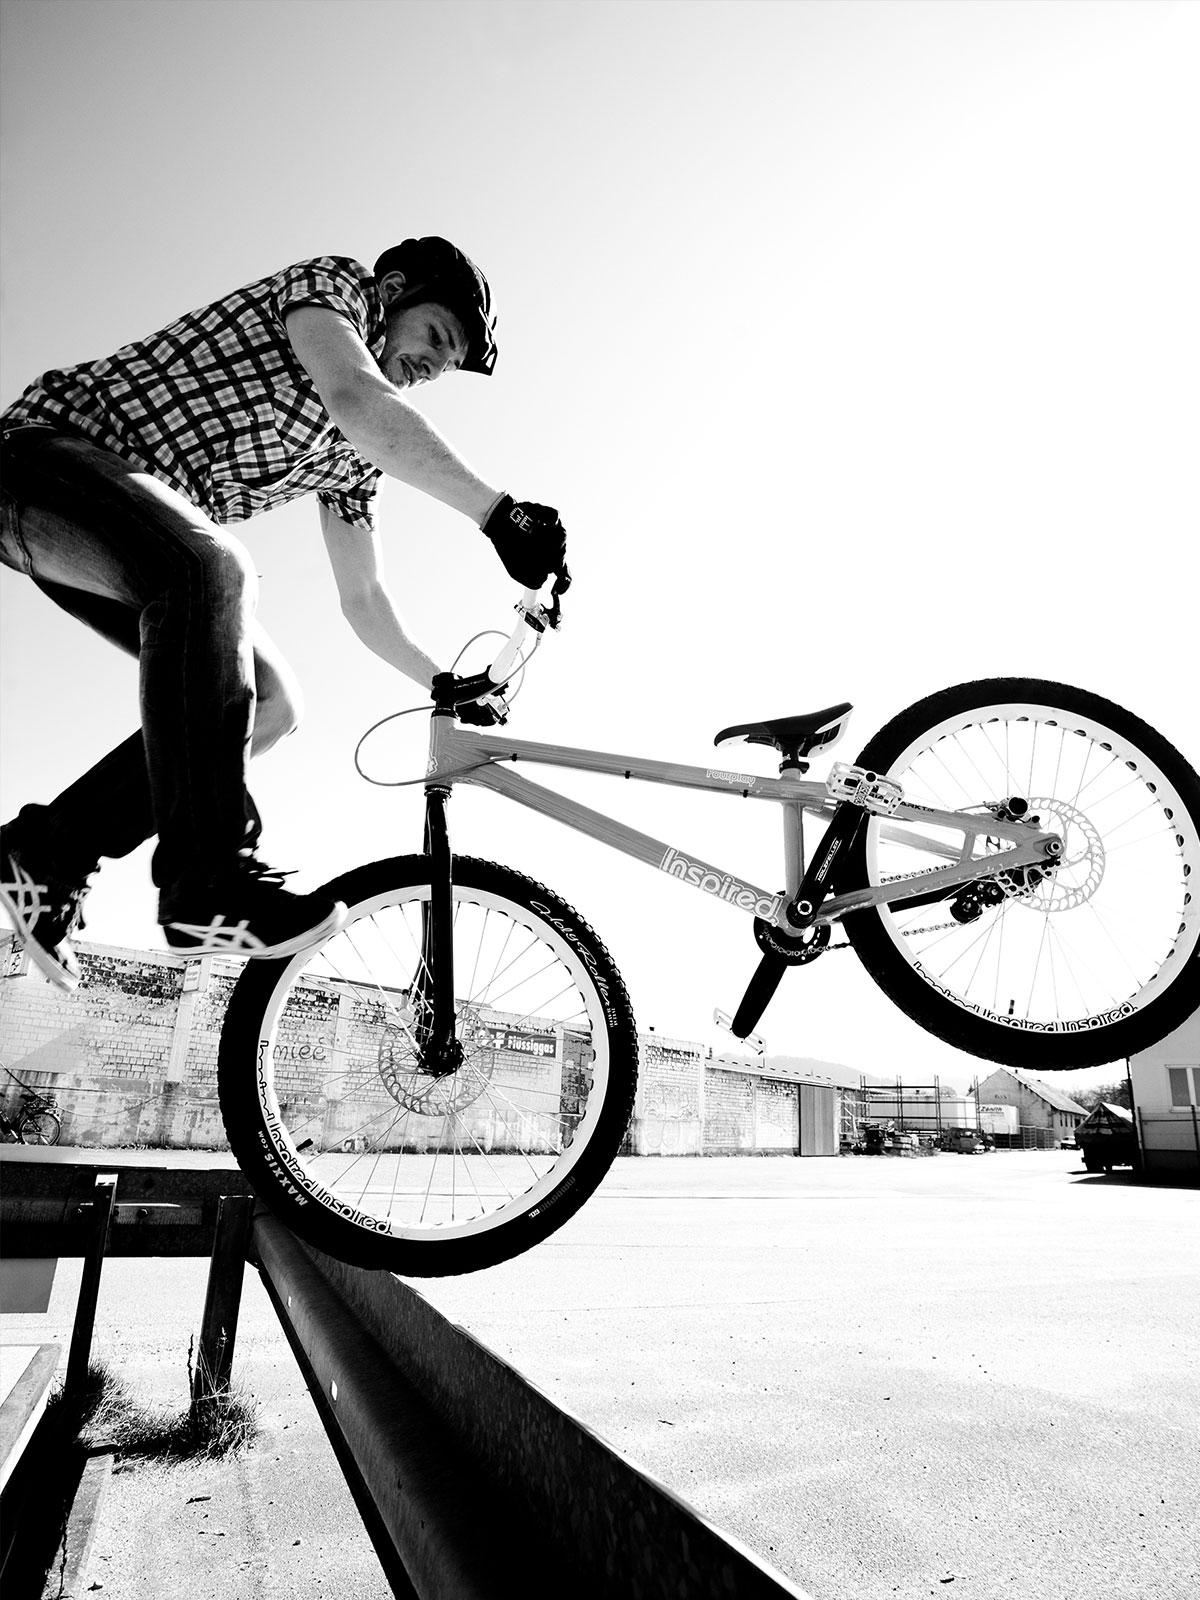 daniel-rall-bike-artist-hornberg-show-high-level-bikeshow